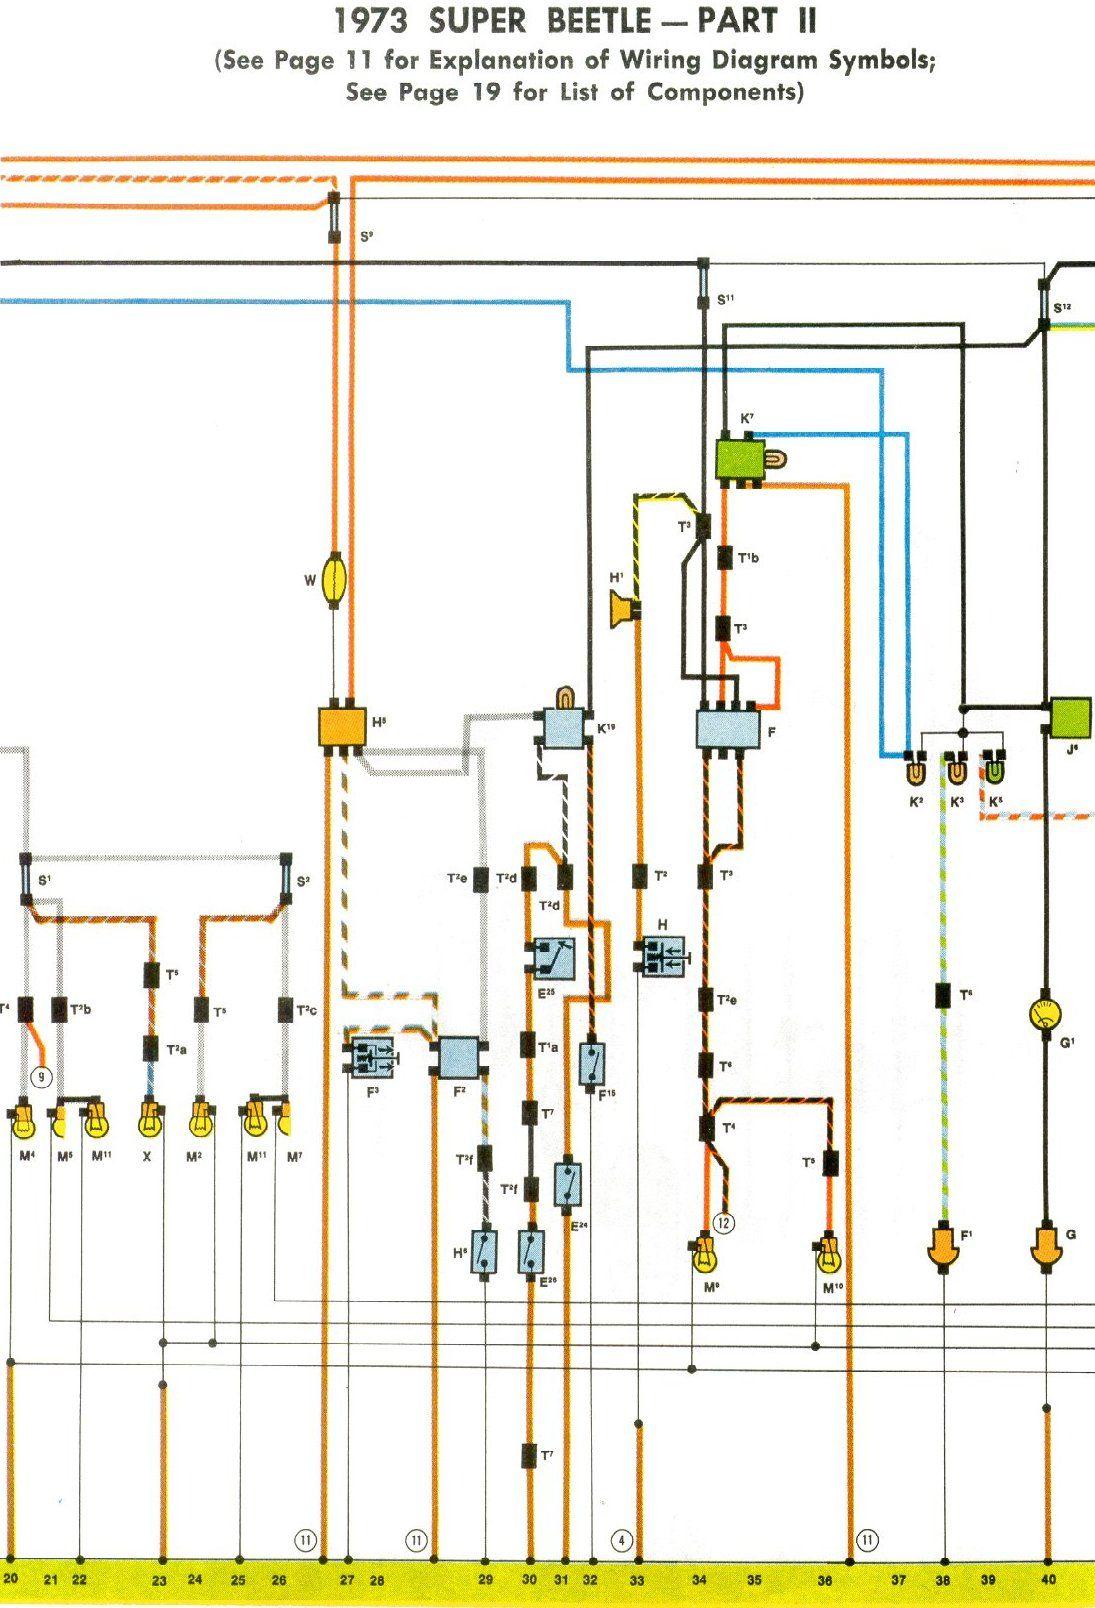 1973 Super Beetle Wiring Diagram | TheGoldenBug.com | Diagram, Beetle, Wire